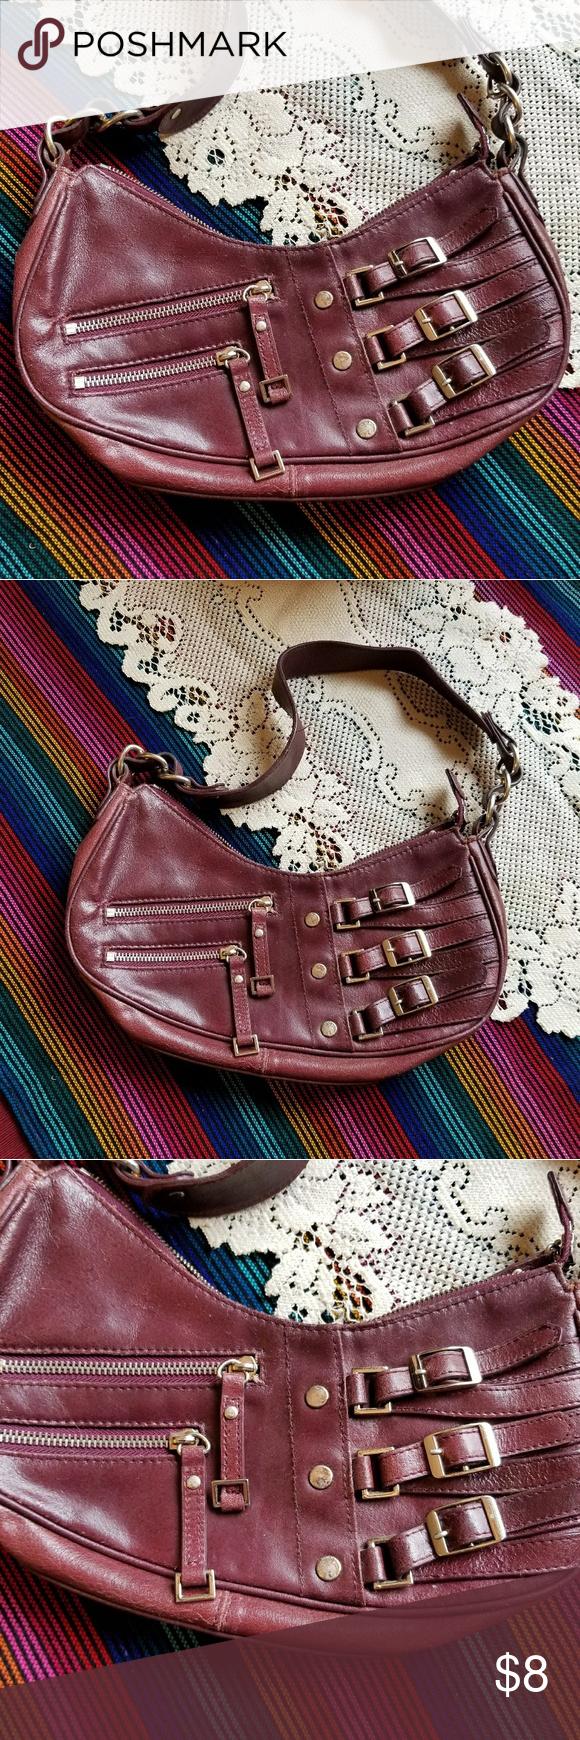 Wilson's leather purse Wilsons leather purse, Wilsons